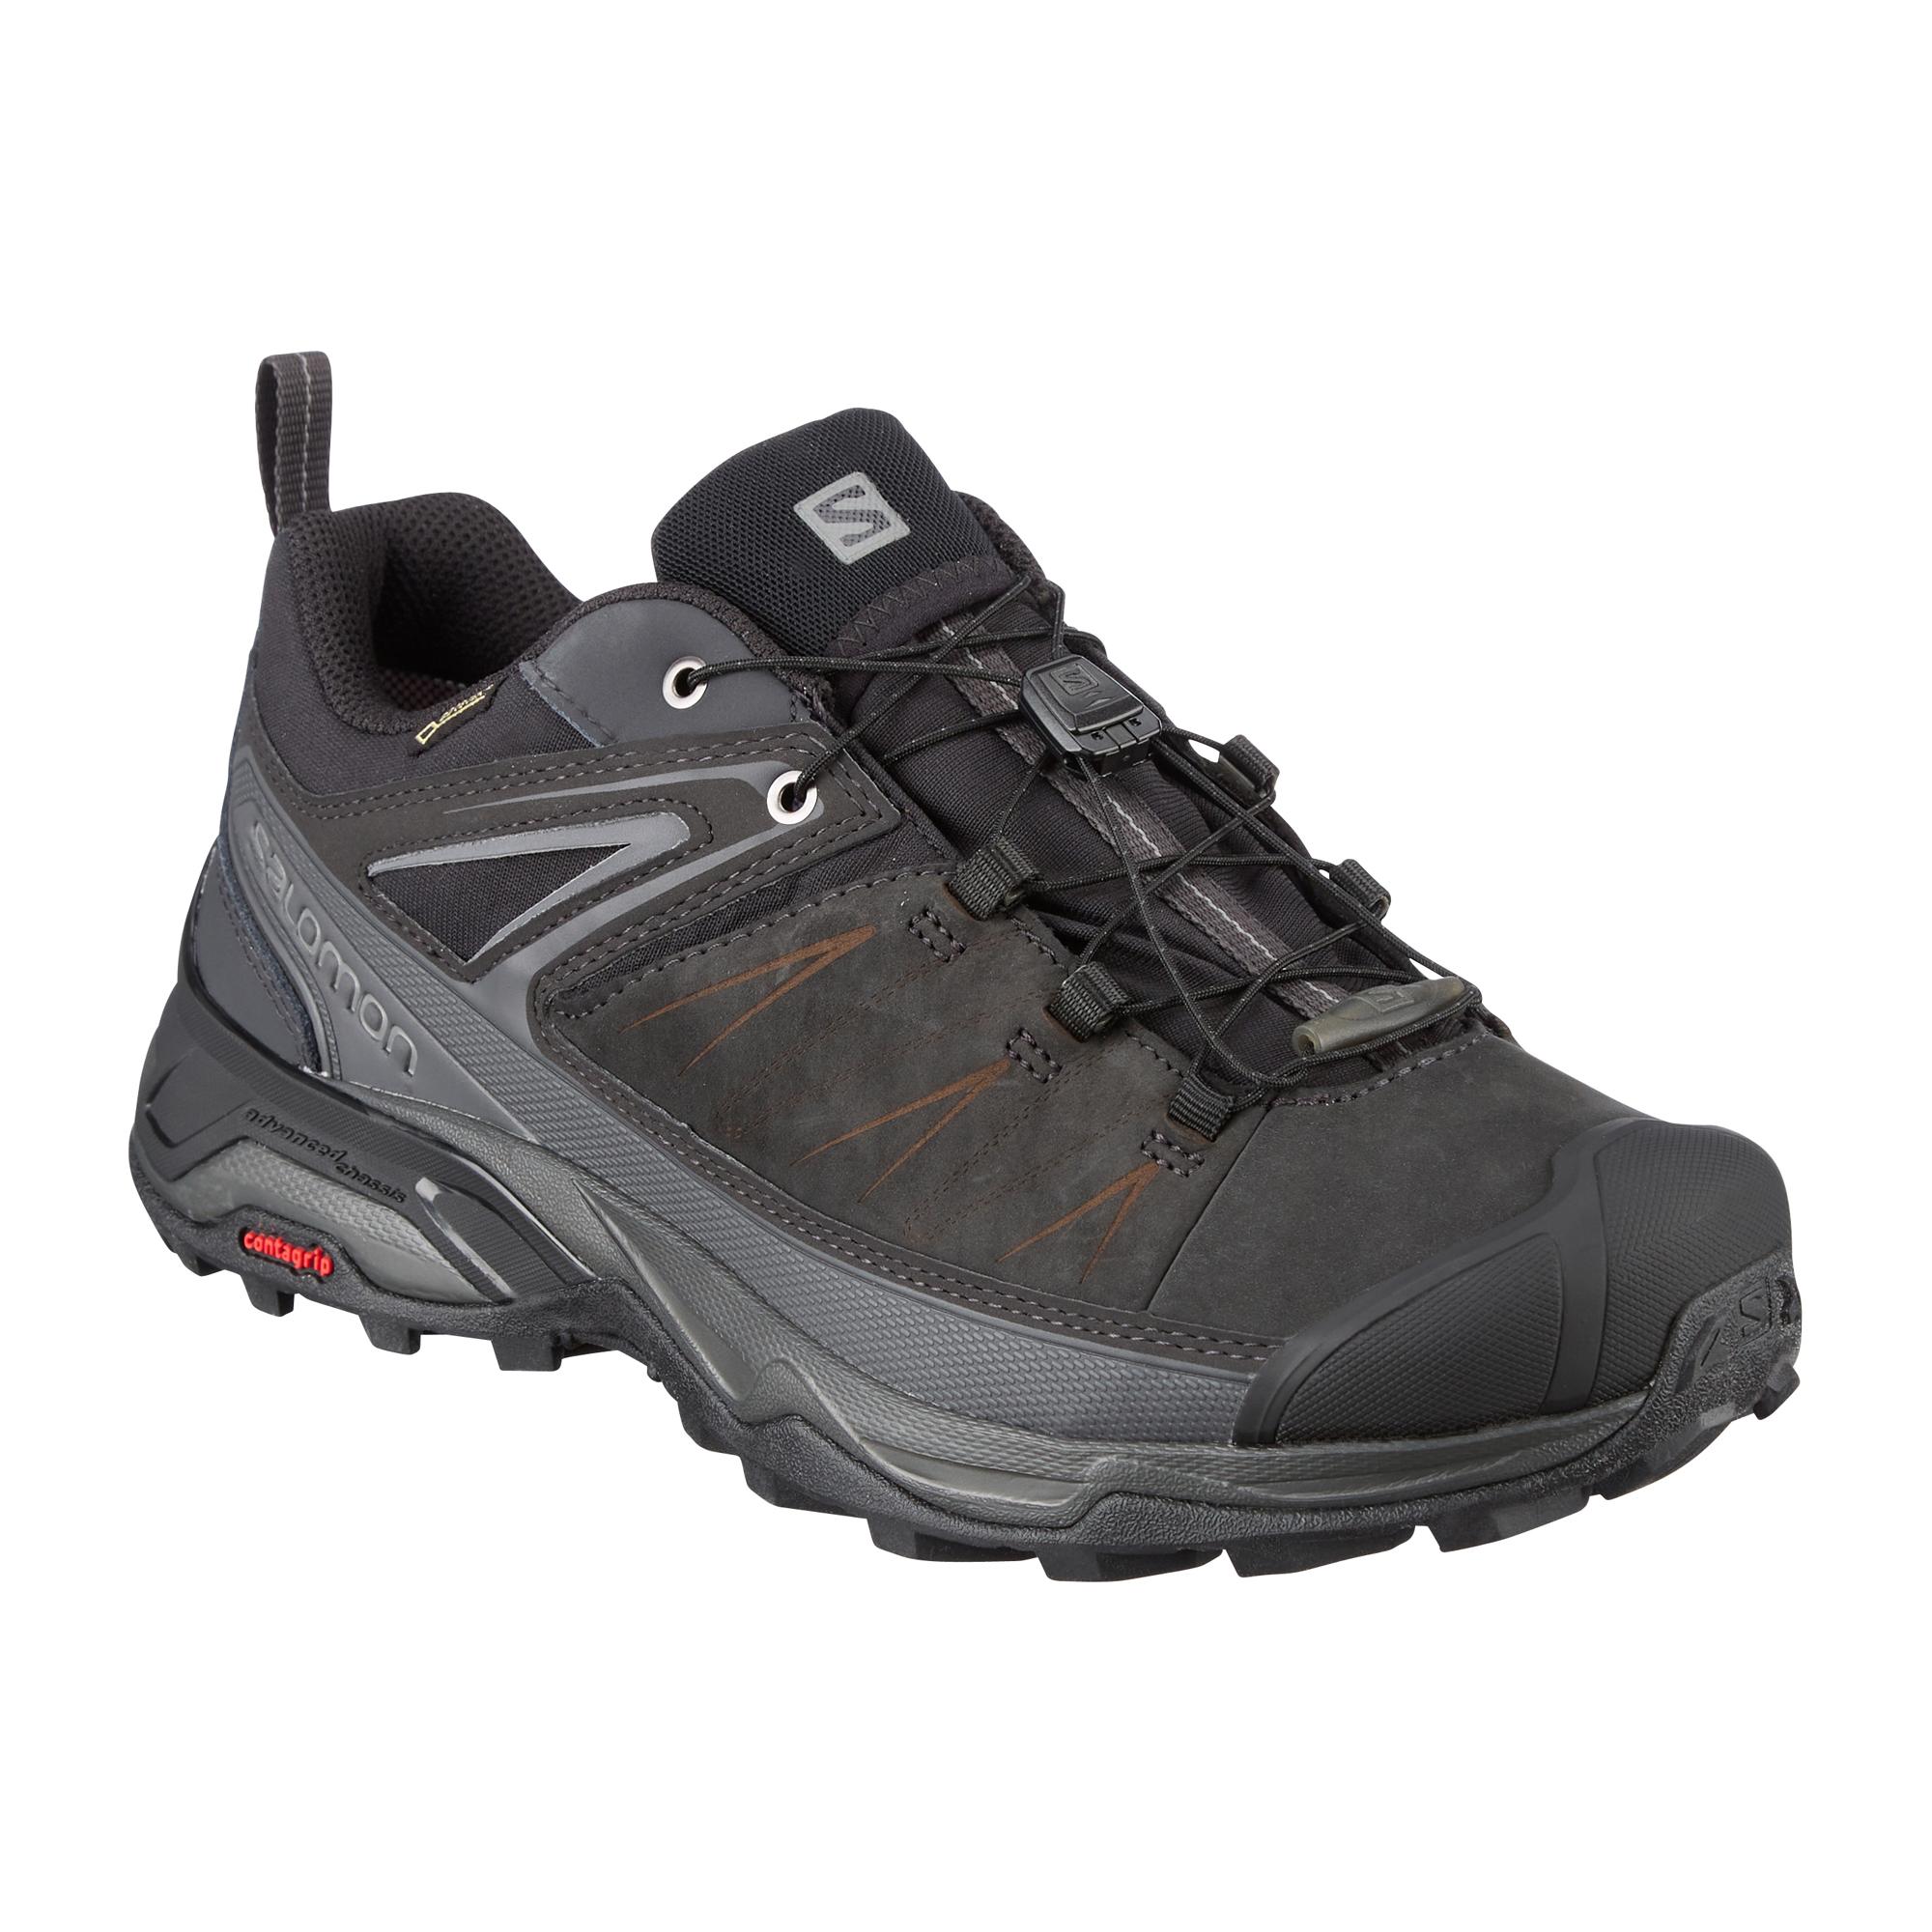 Salomon X Ultra 3 Ltr GTX Womens Hiking Shoes